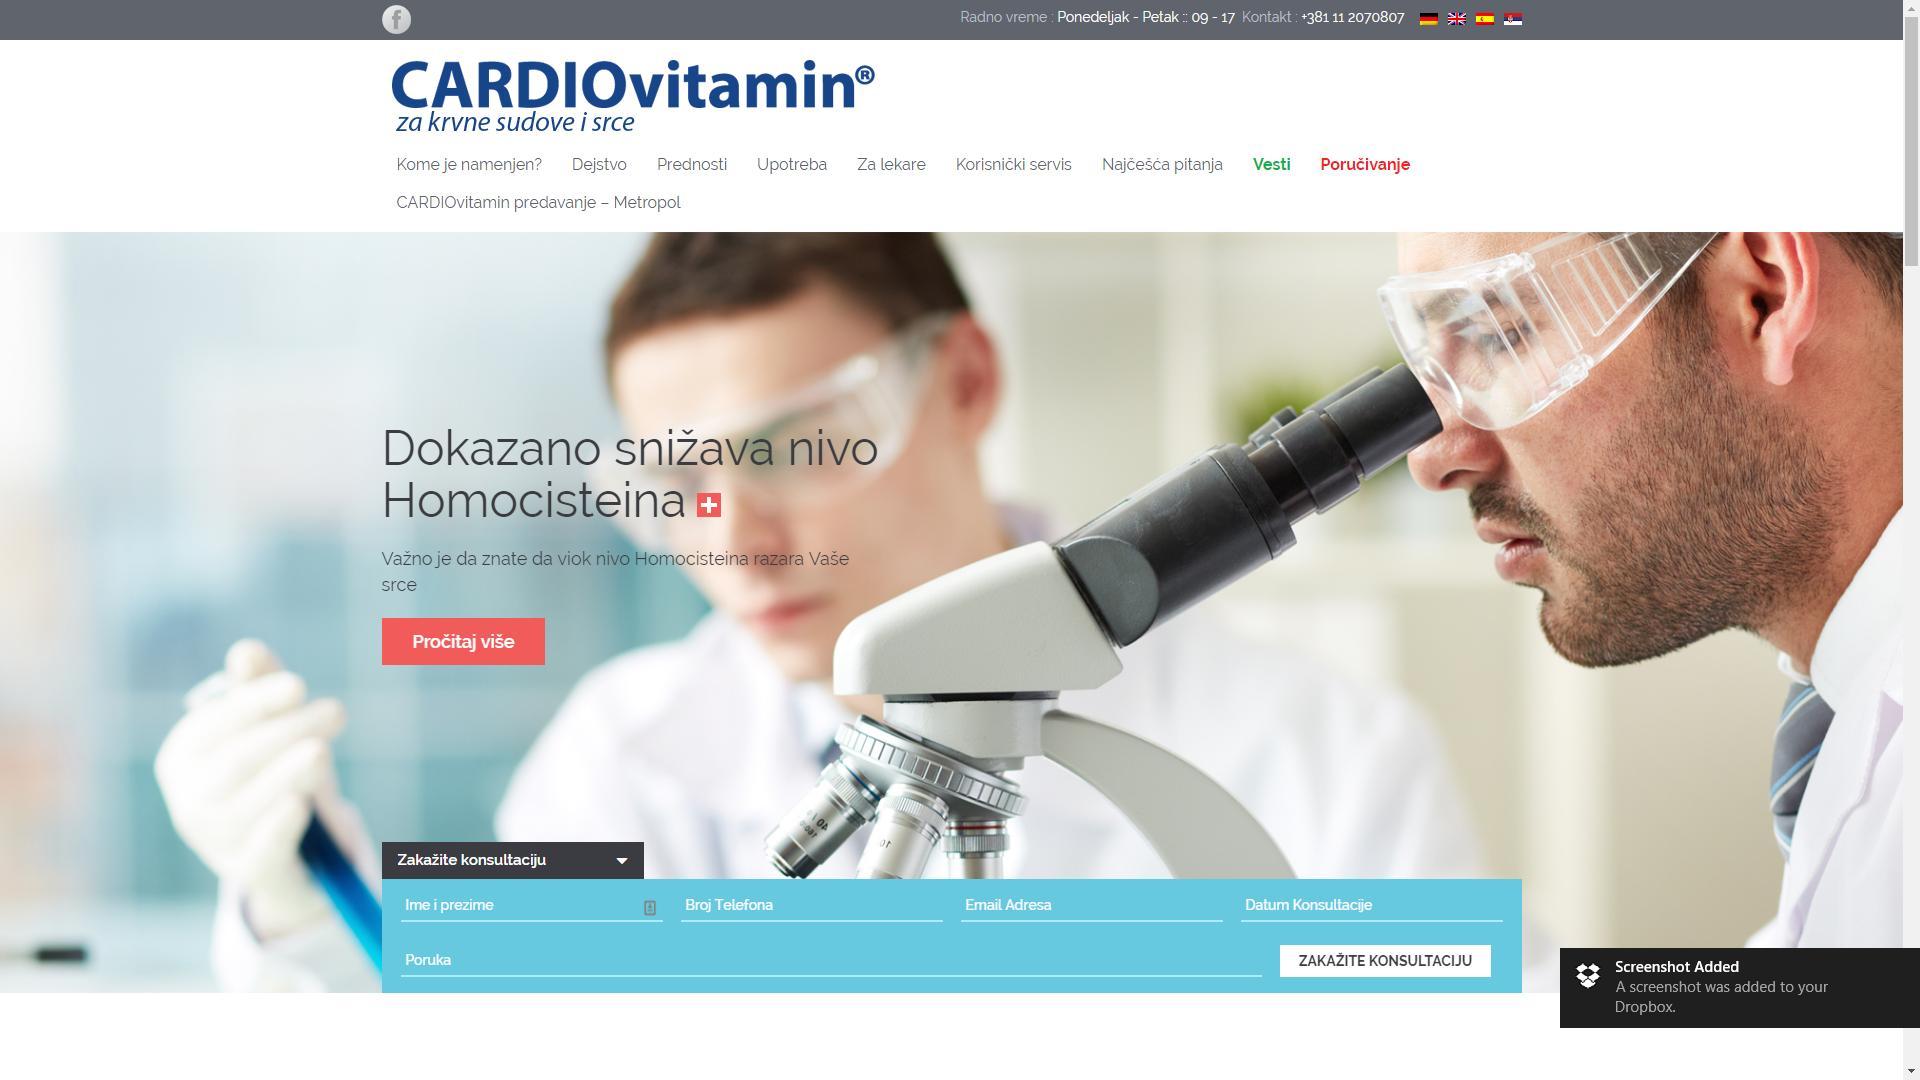 sKa portfolio sajtovi - Cardiovitamin 3